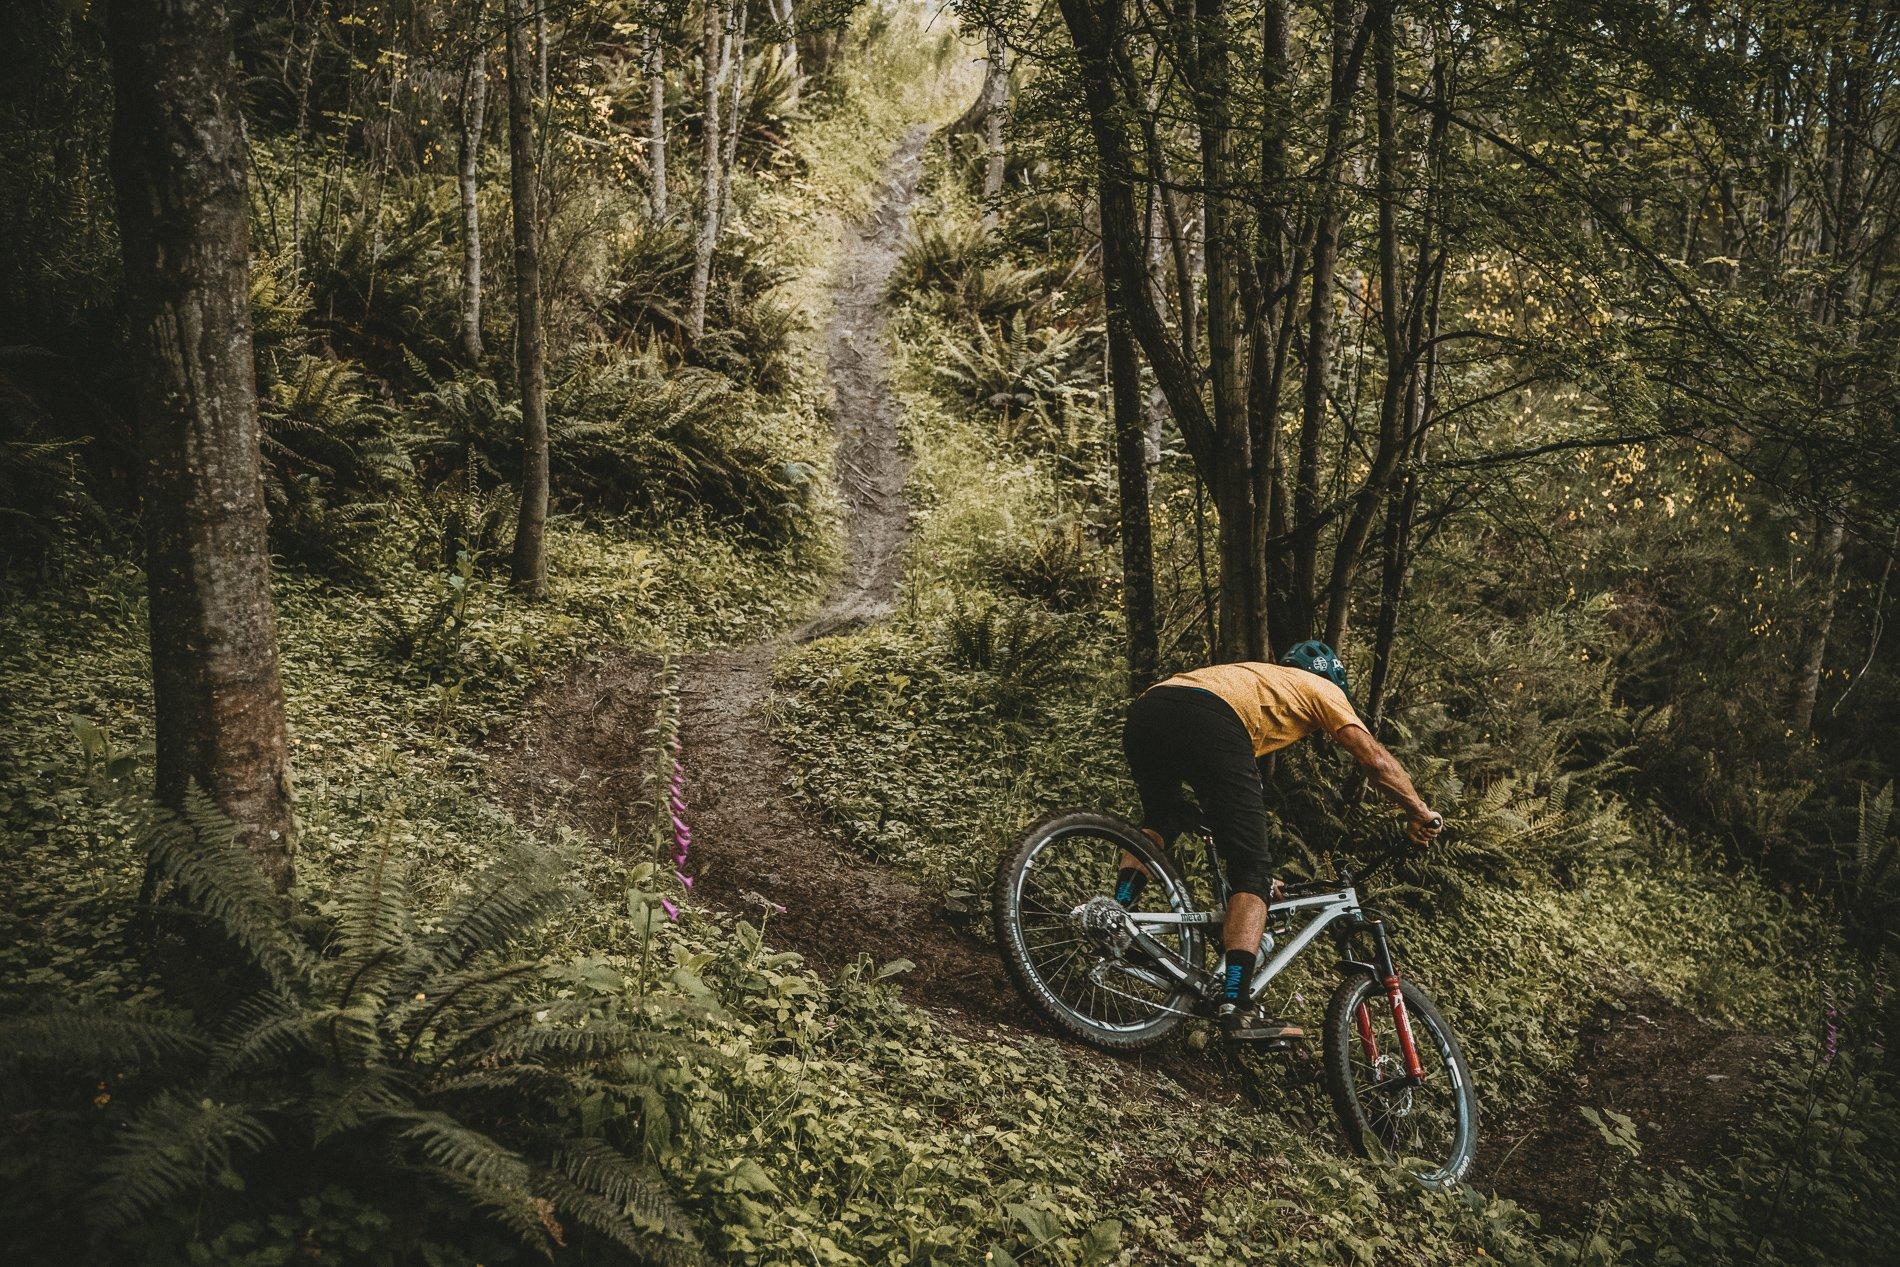 Mountain biker riding on Goodyear tires